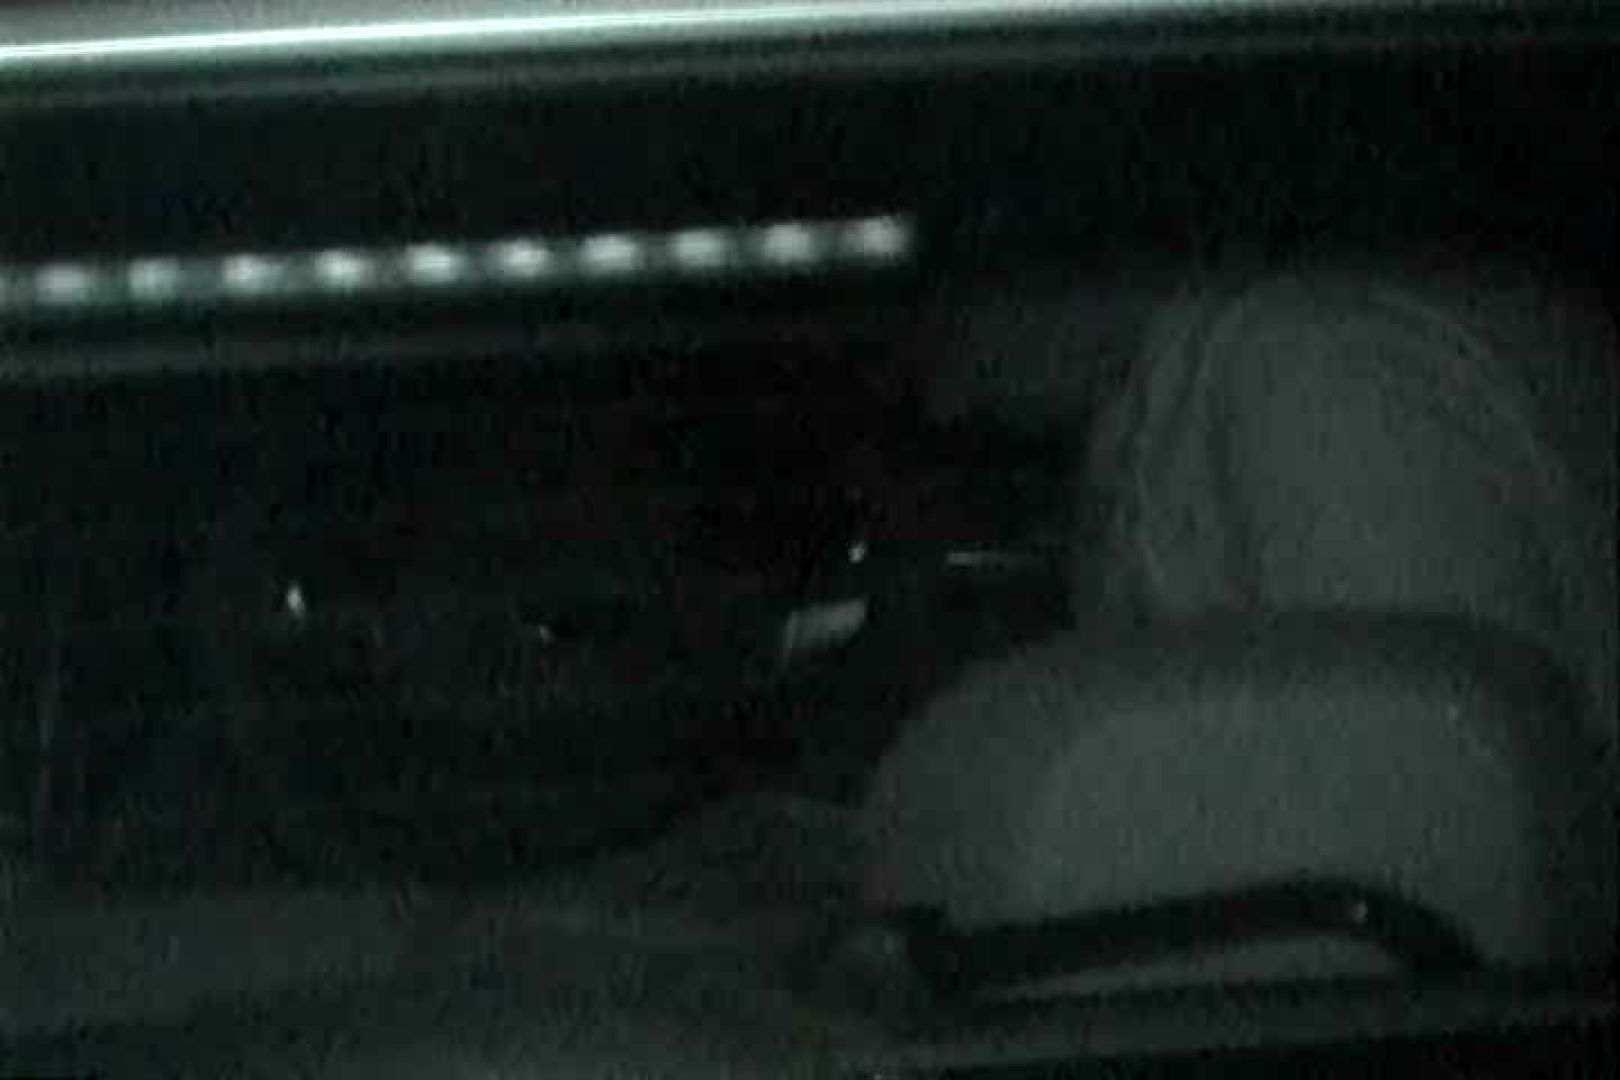 充血監督の深夜の運動会Vol.124 赤外線 オメコ無修正動画無料 97画像 5